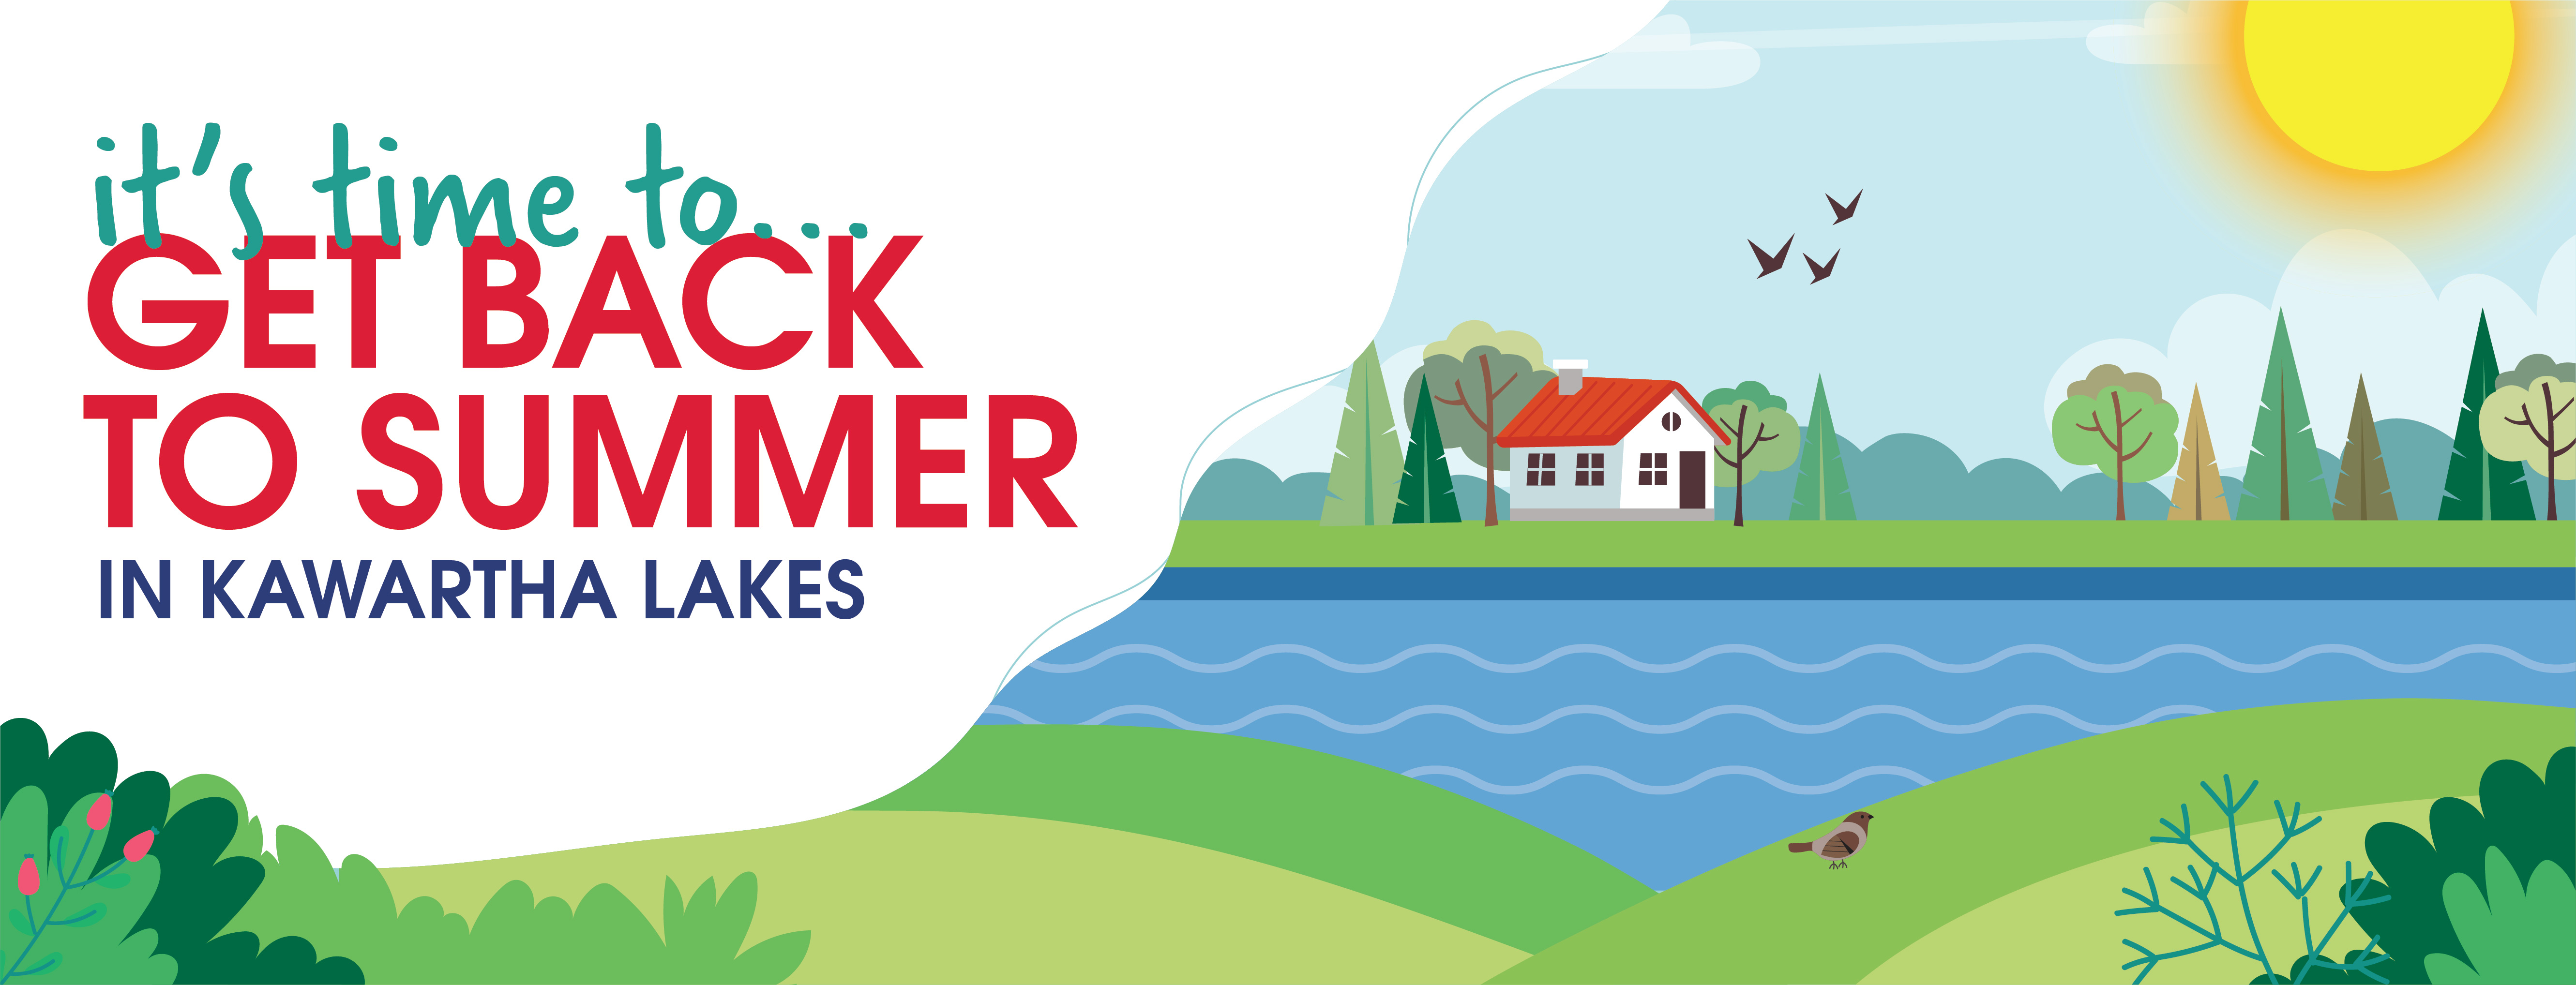 Get back to Summer in Kawartha Lakes